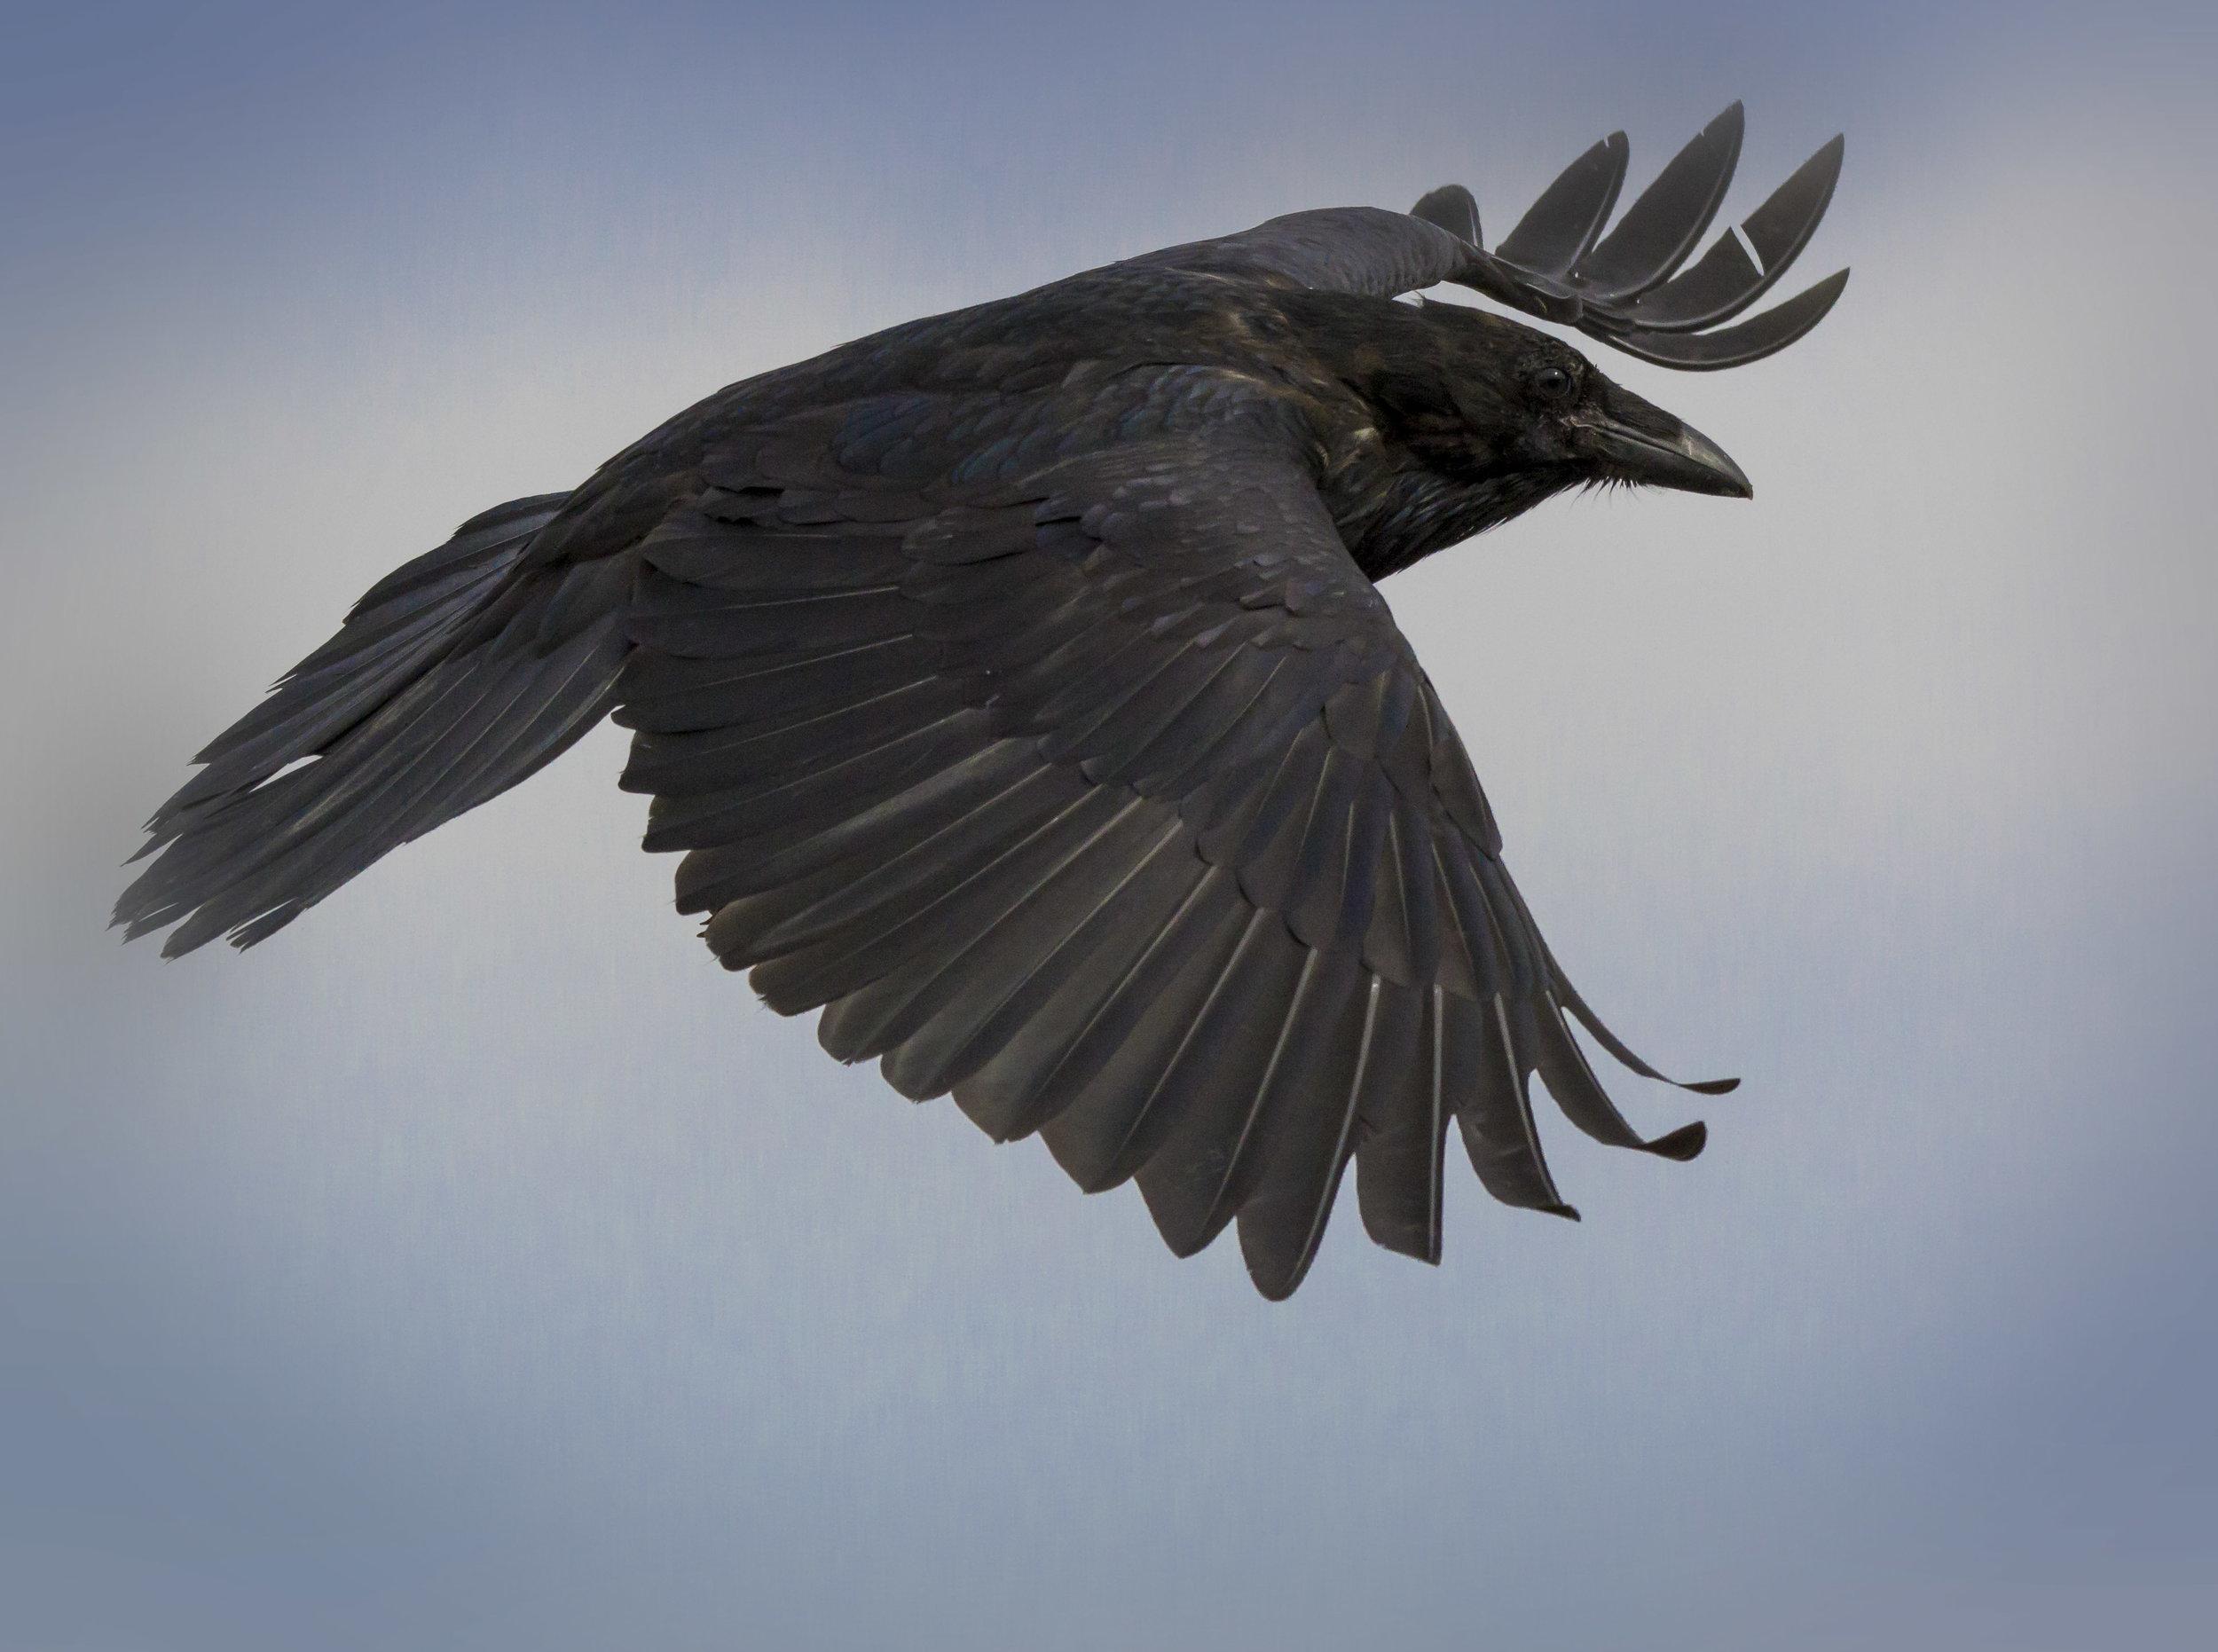 Dempster Highway, Roadtrip, Landscape, Arctic, rob gubiani, Tundra, Tombstone, Tuktoyuktuk, Inuvik, Dempster, Yukon, travel, wanderlust, raven, fly, flight,